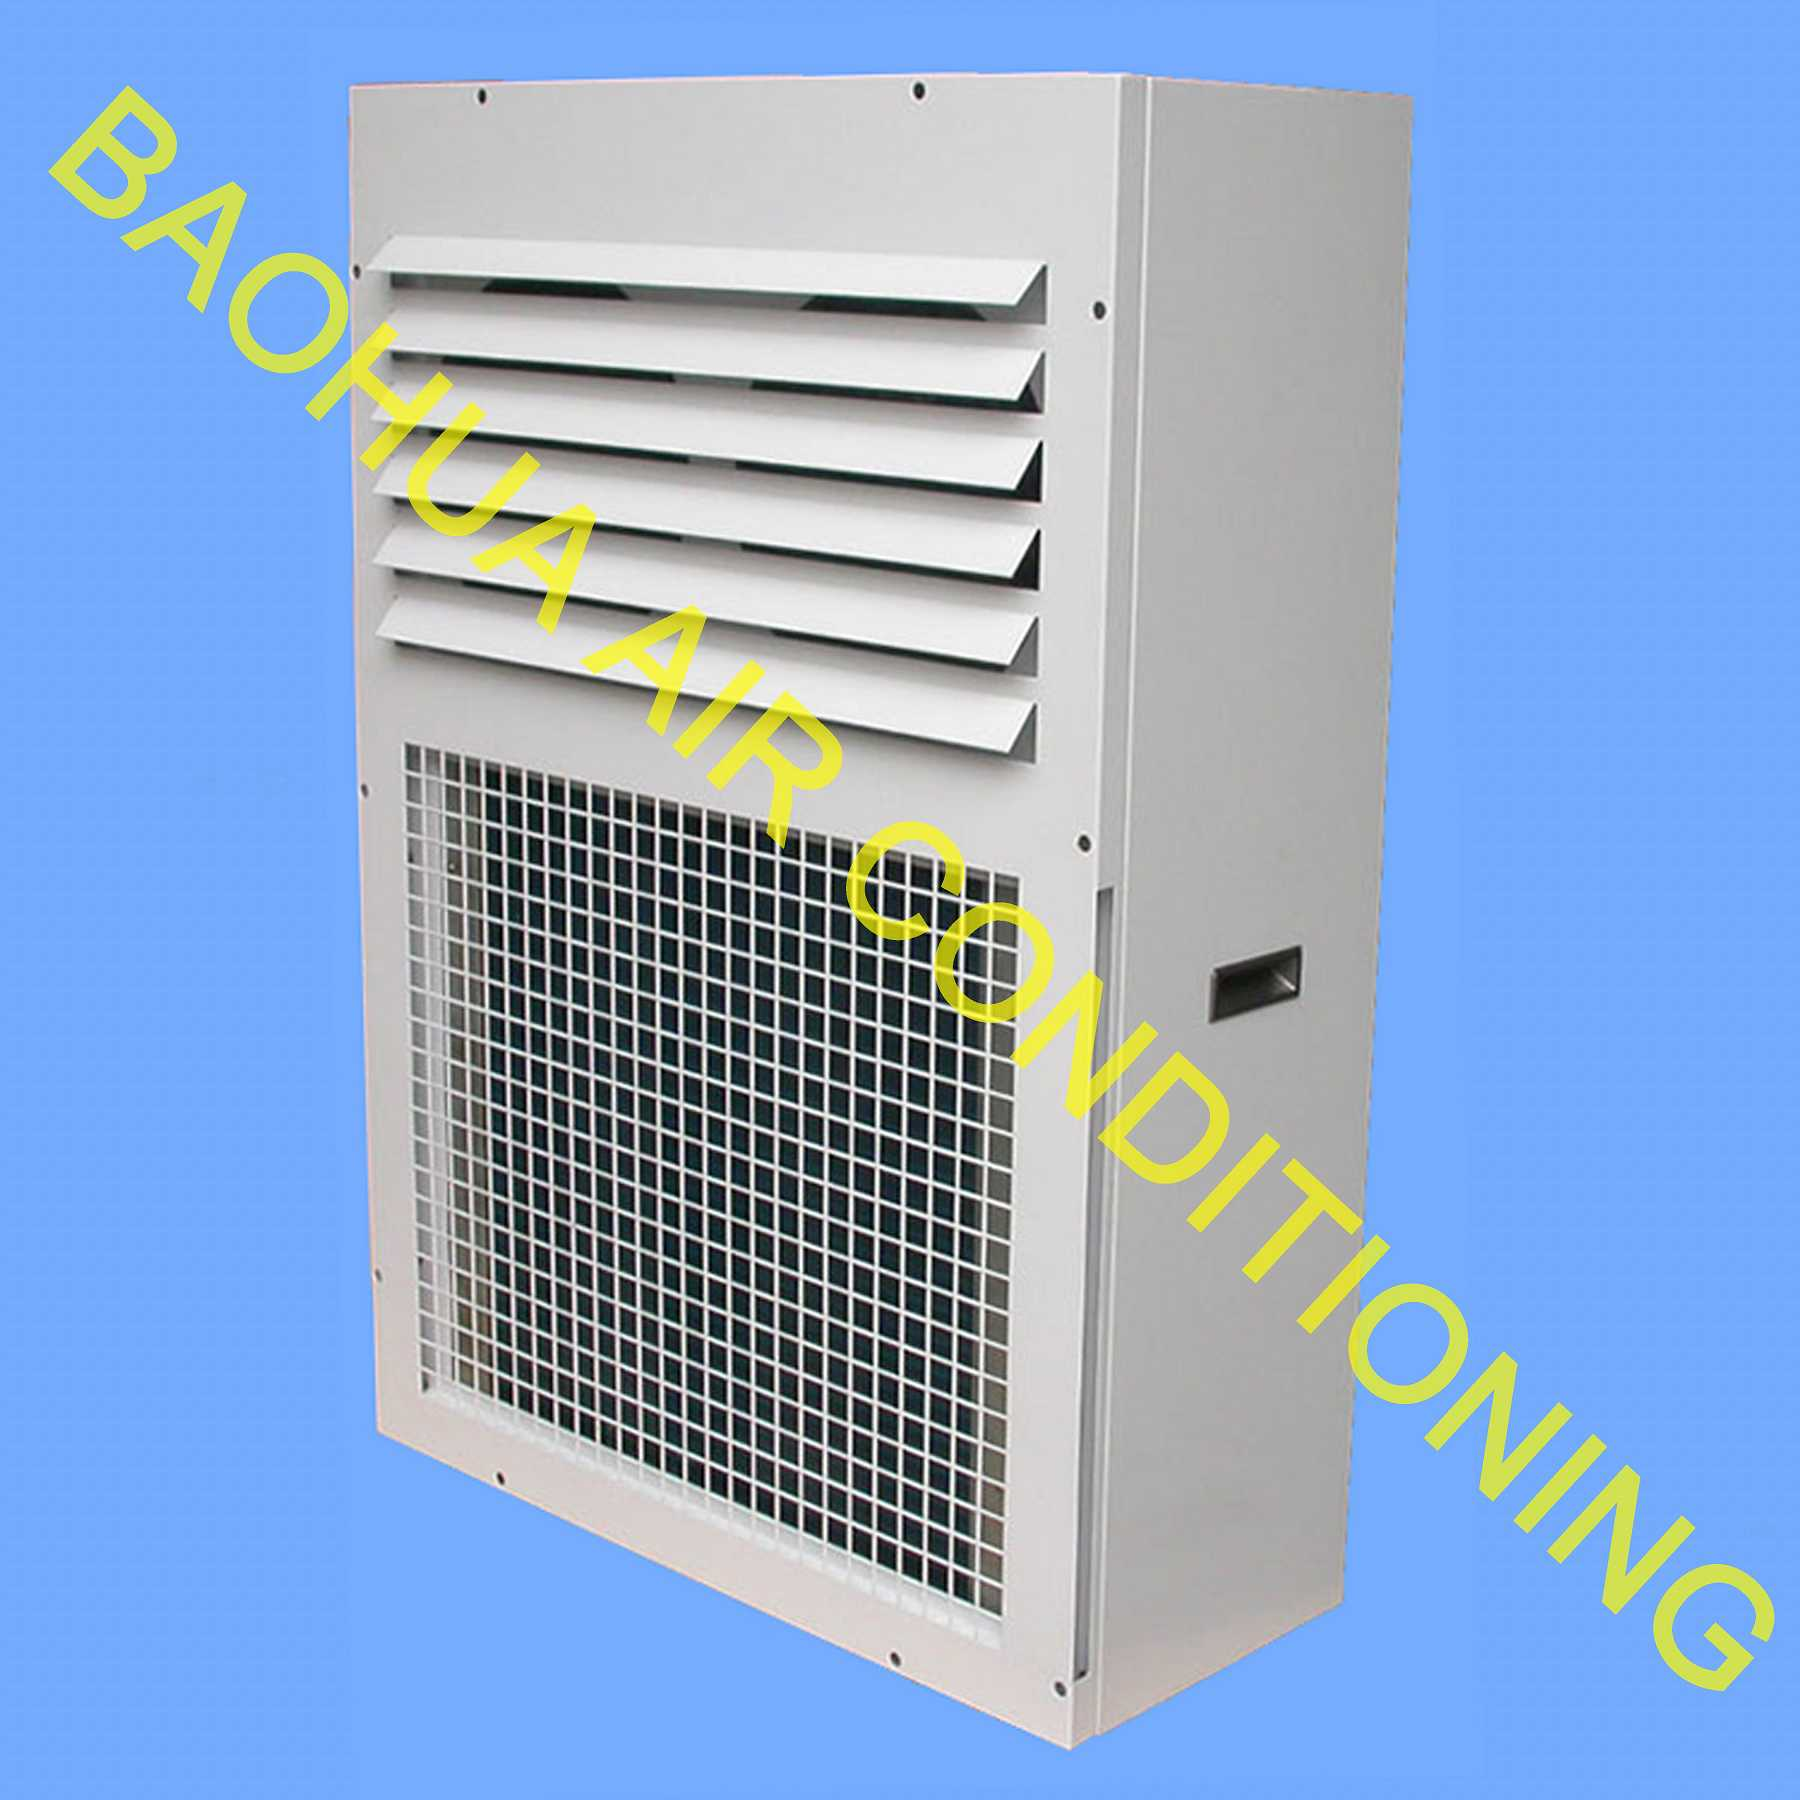 Telecom Base Station Air Conditioner (更新时间:2010/11/2 20:12  #0451C7